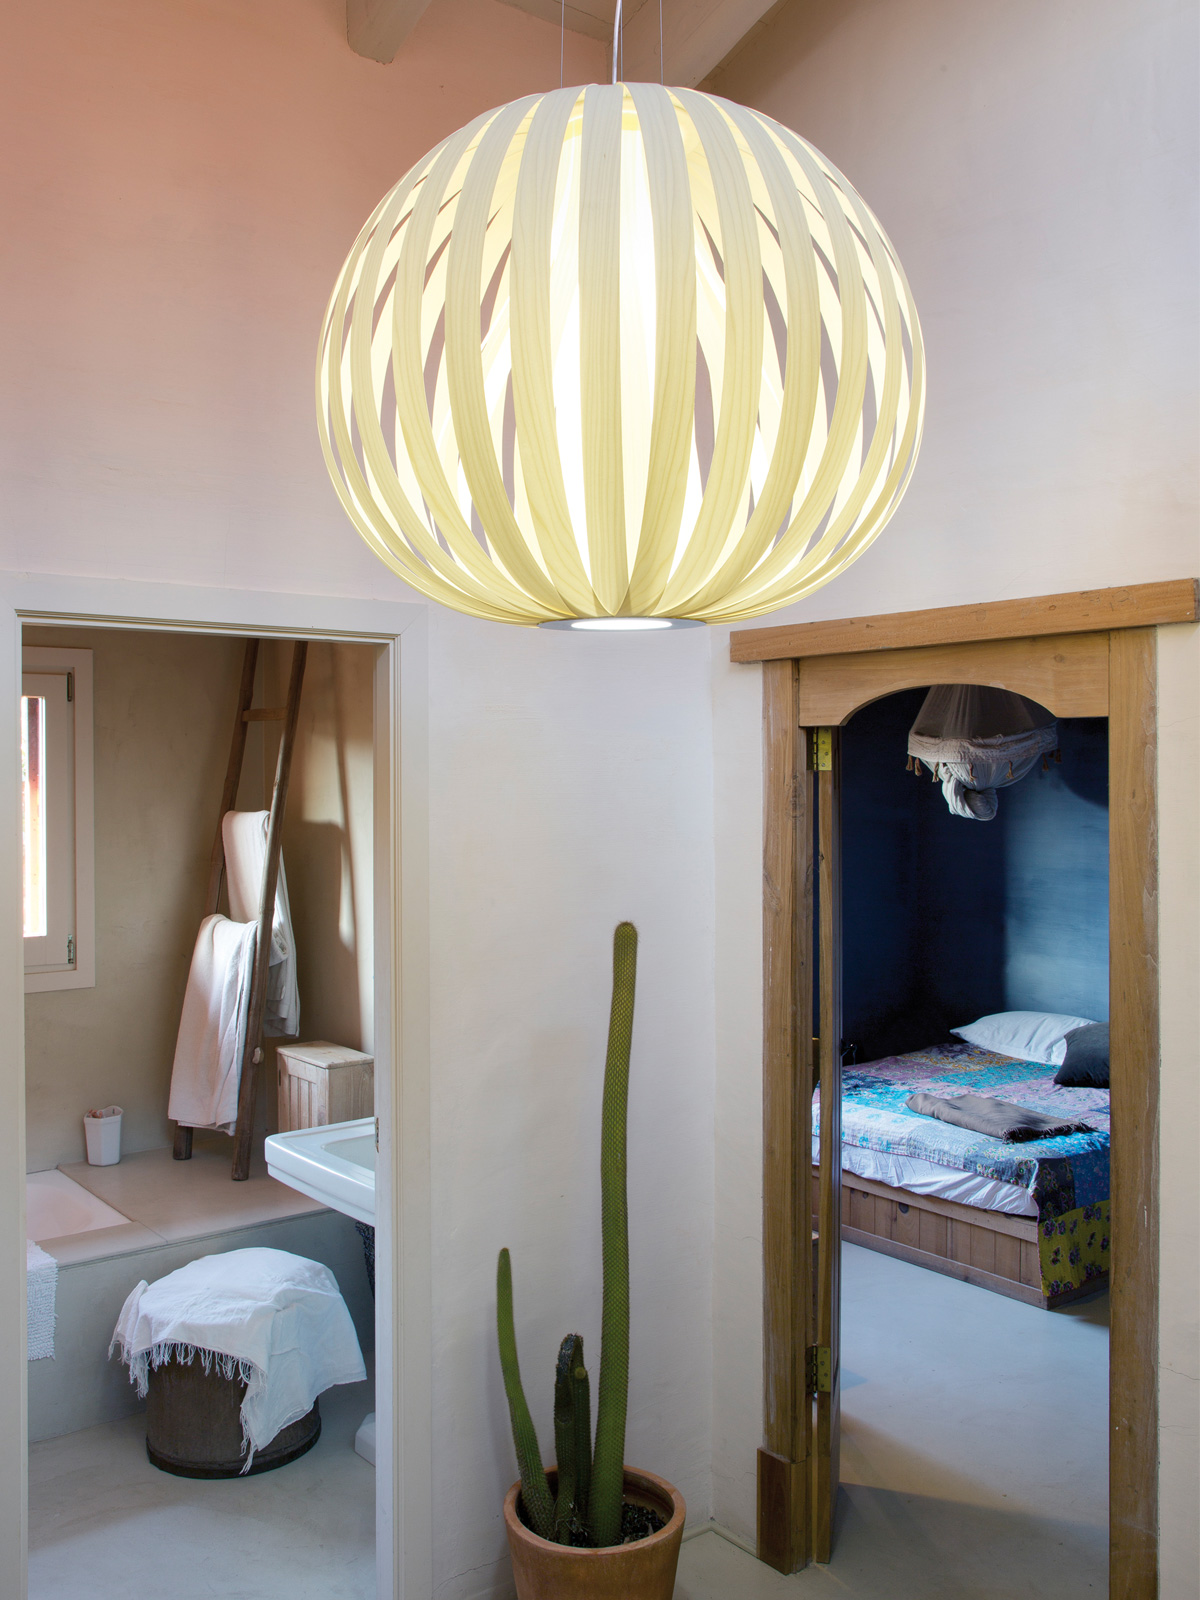 DesignOrt Blog: Poppy Pendelleuchte LZF Lamps